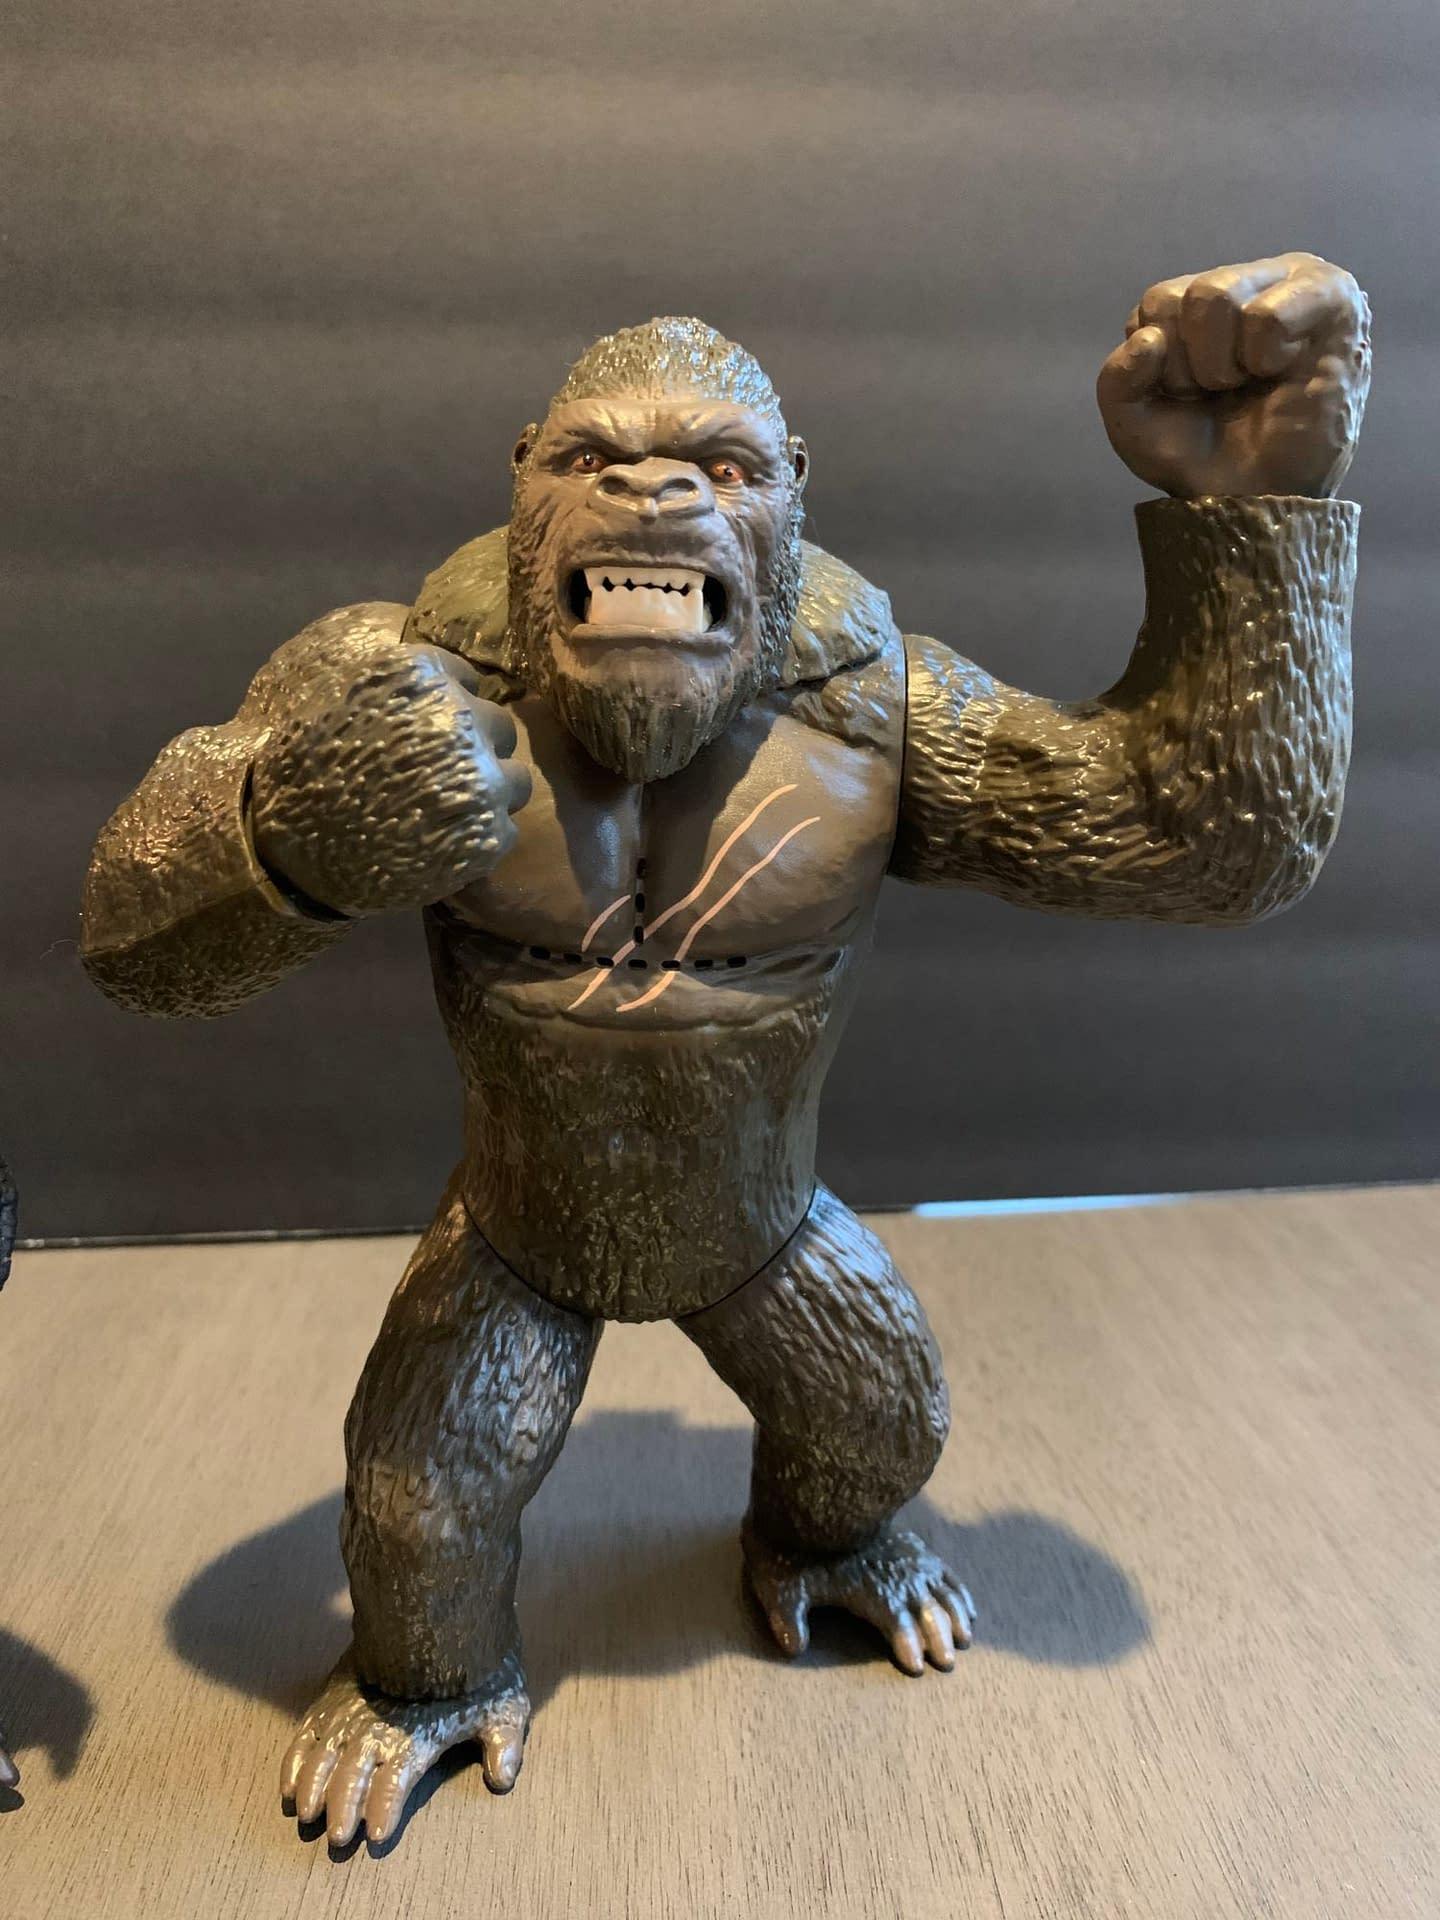 Godzilla Vs Kong Playmates Figures Are Big Dumb Fun